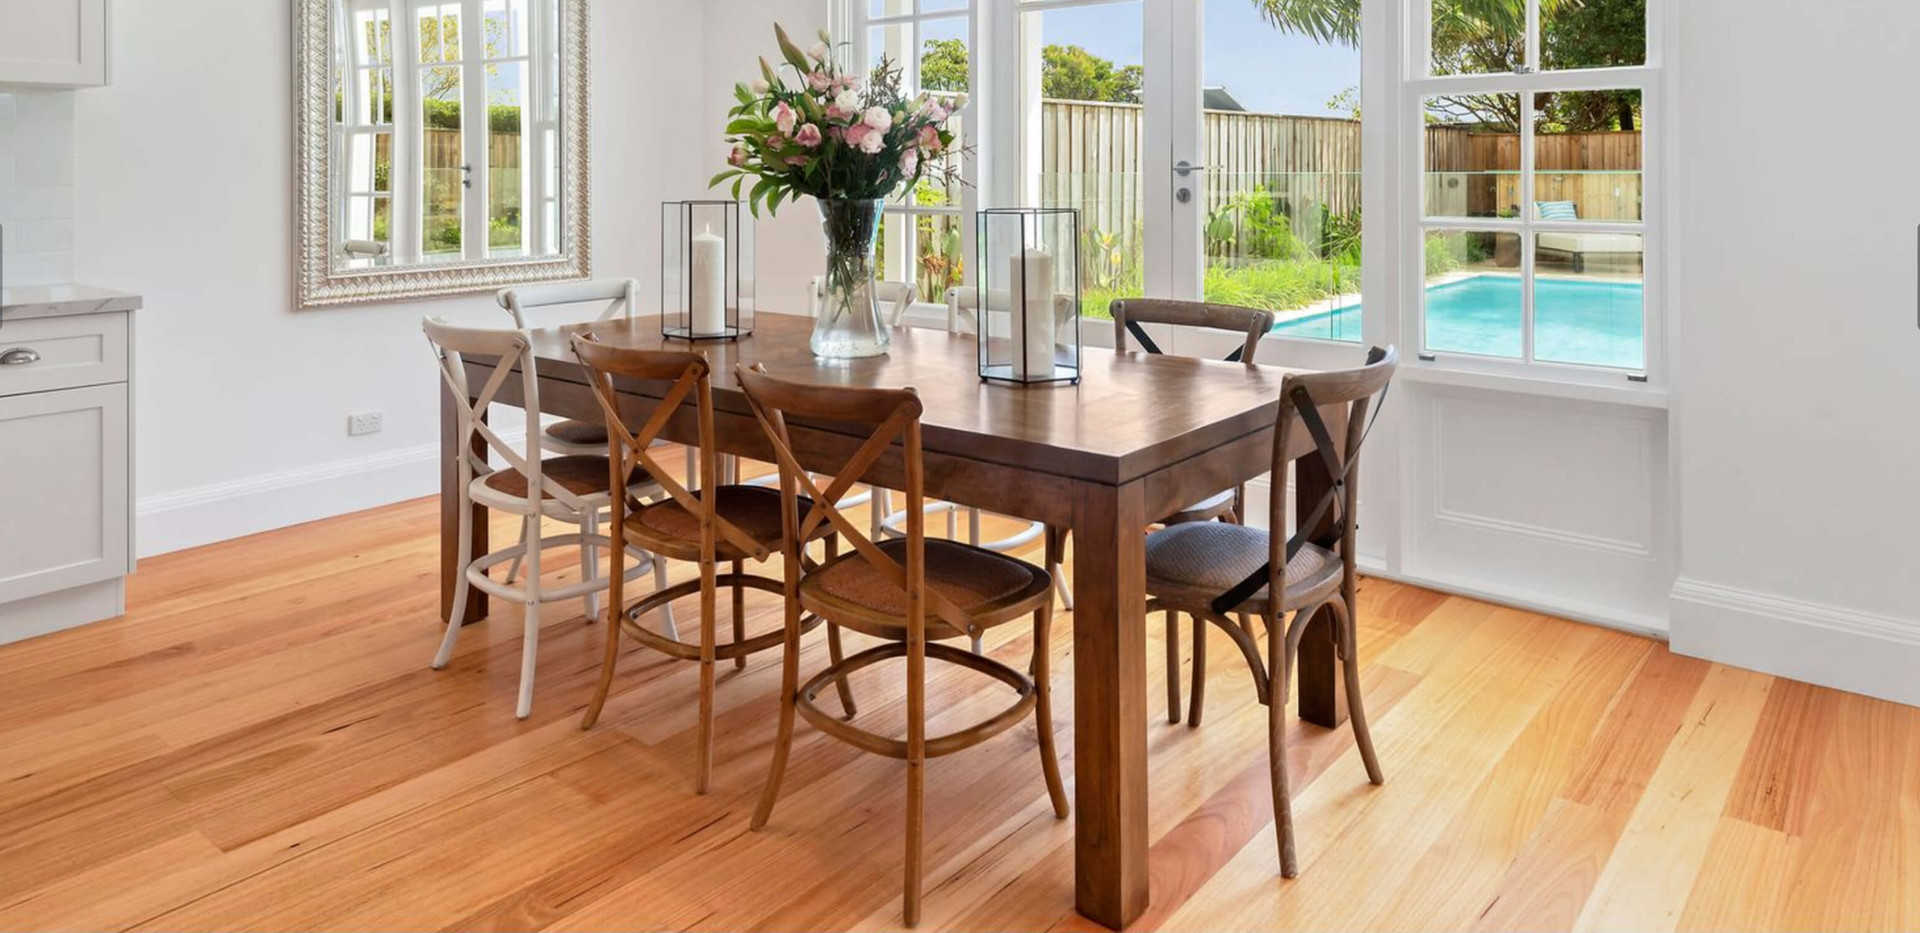 Seaforth Hamptons House - Luxury residential interior design